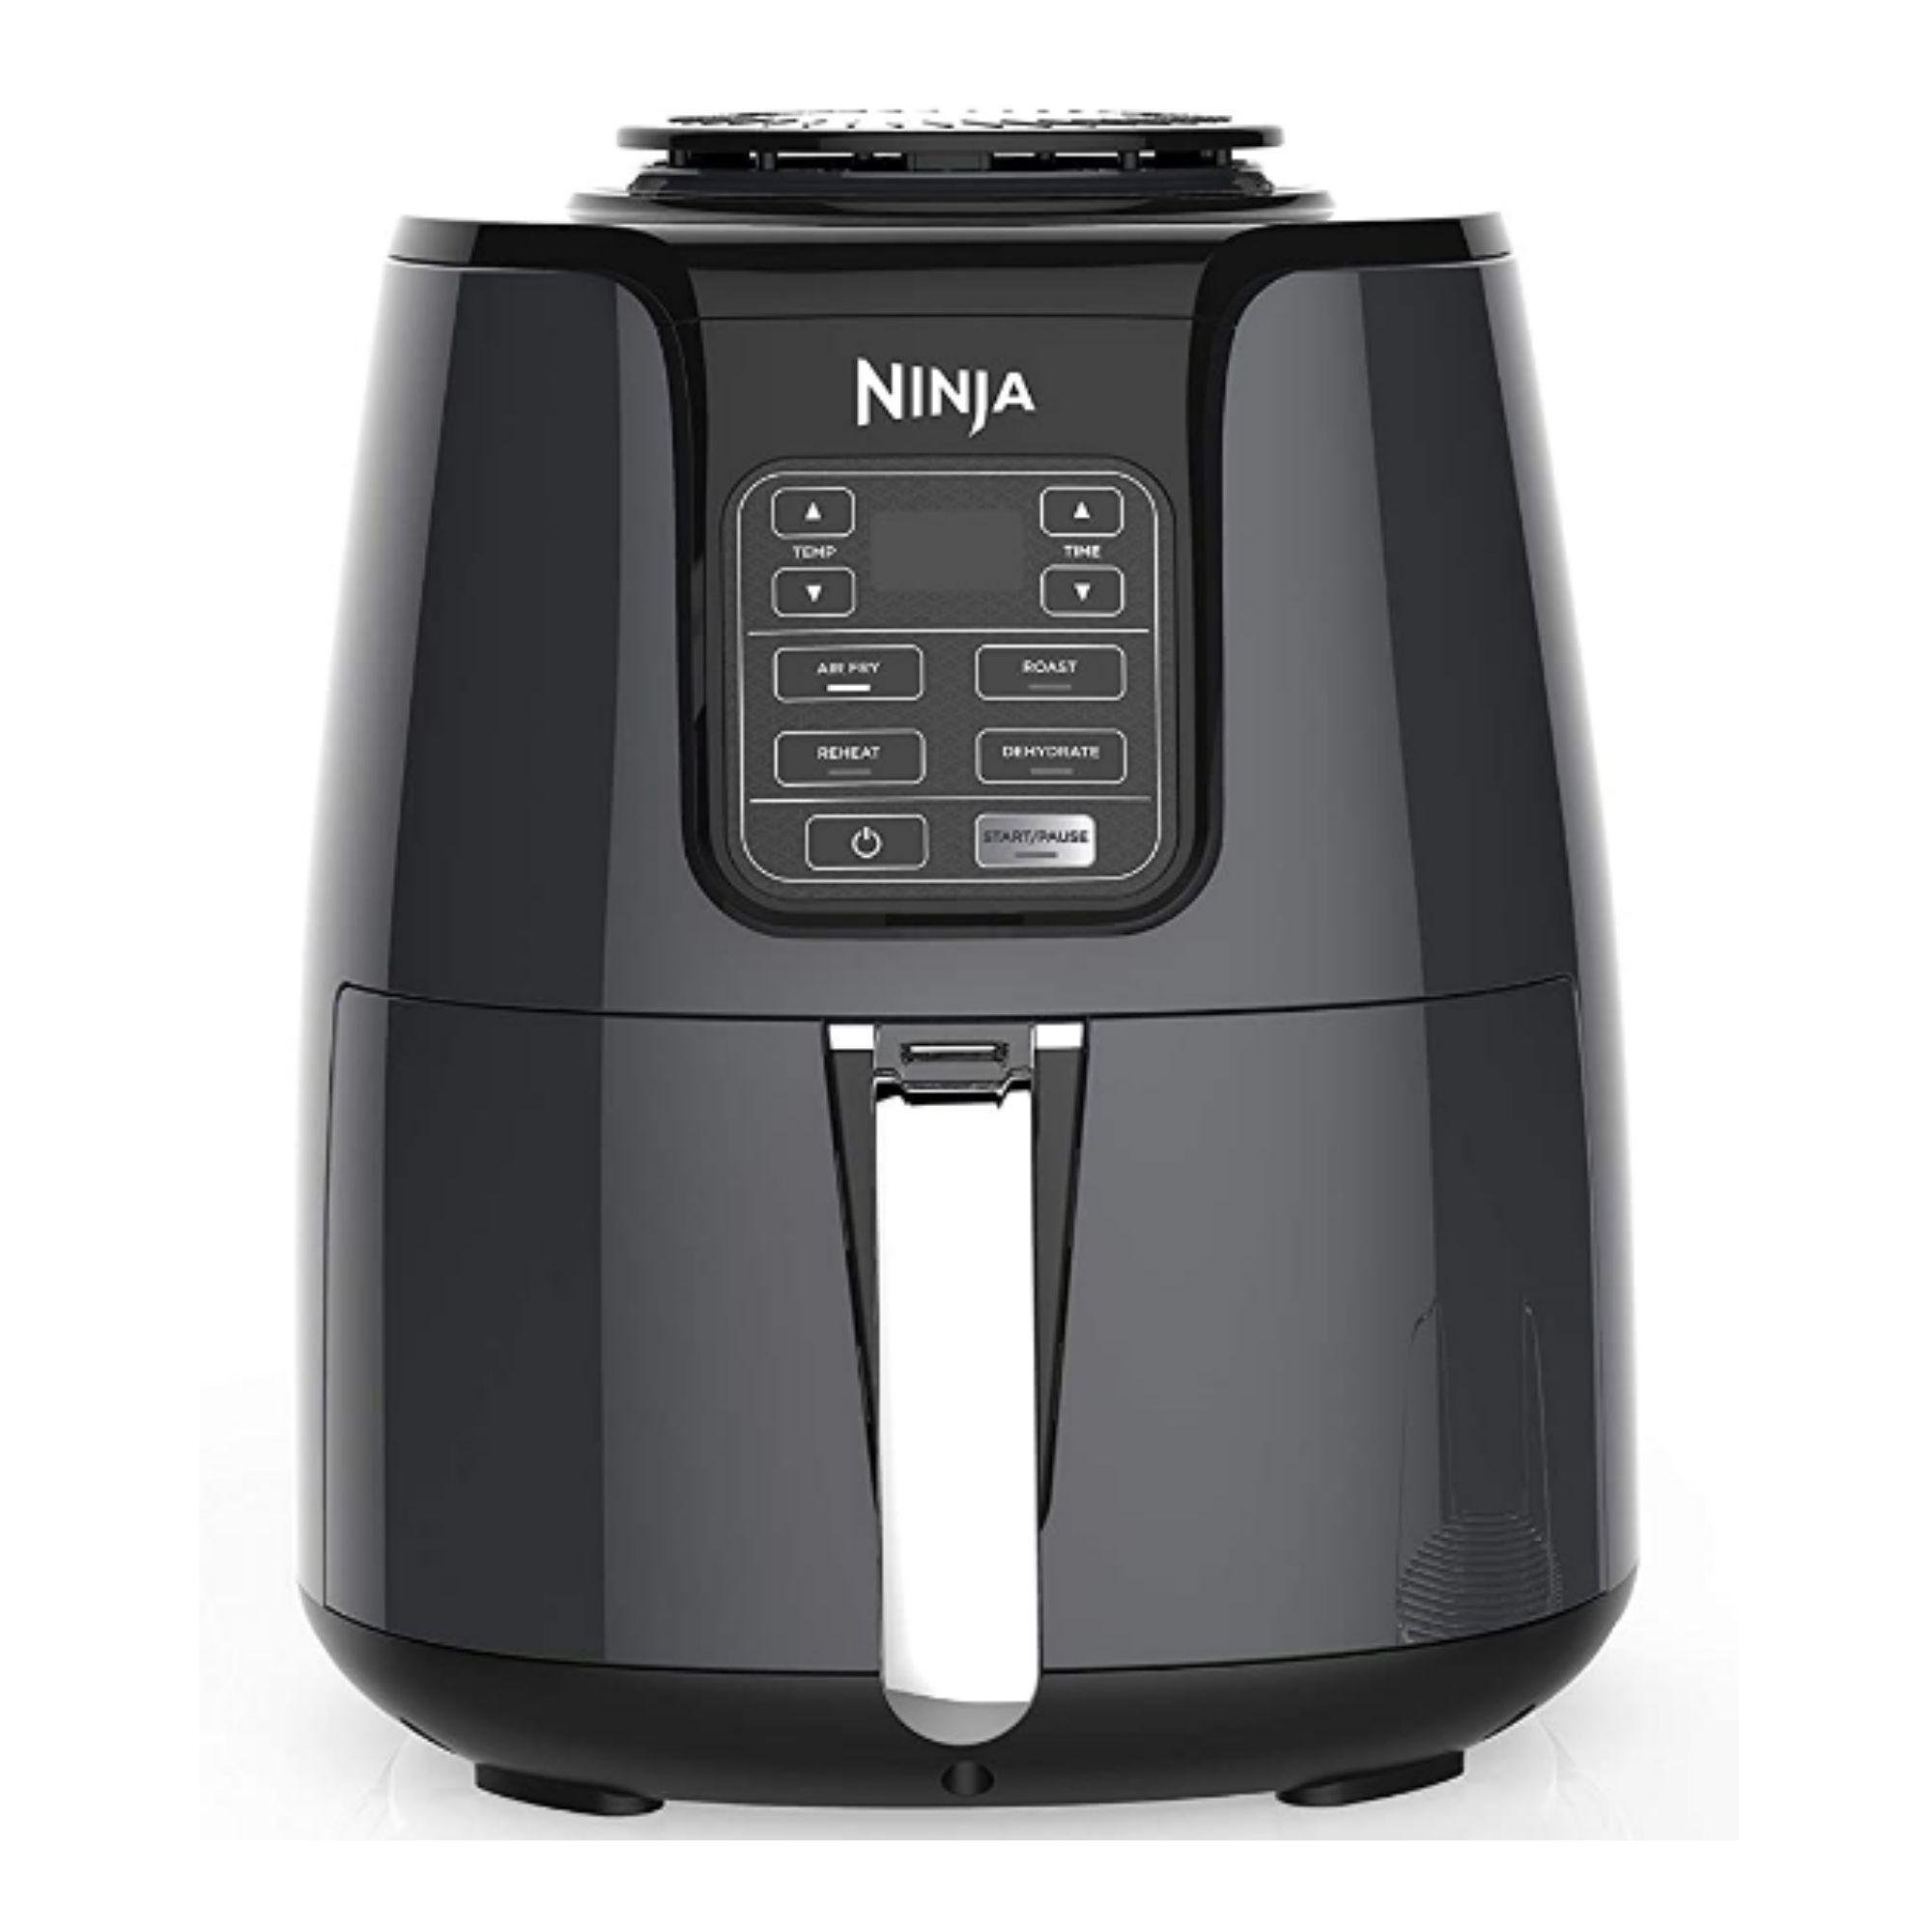 Ninja Four-Quart Air Fryer